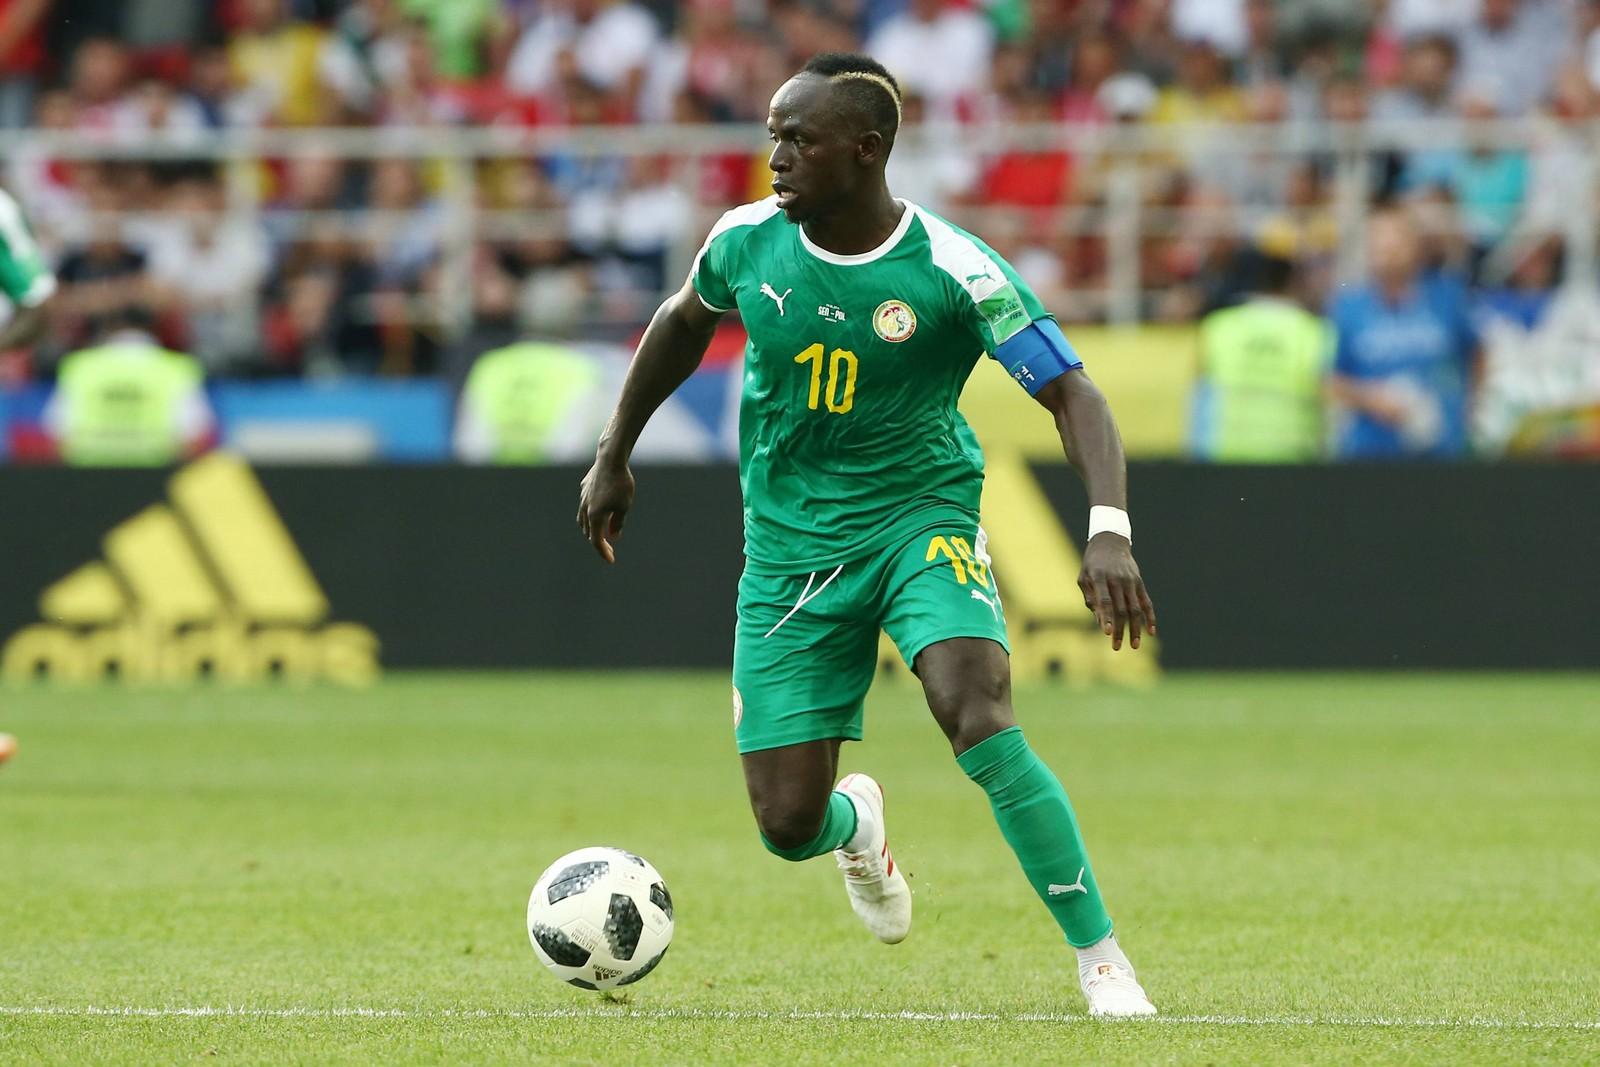 Trifft Sadio Mané gegen Kolumbien? Jetzt auf Senegal gegen Kolumbien wetten!